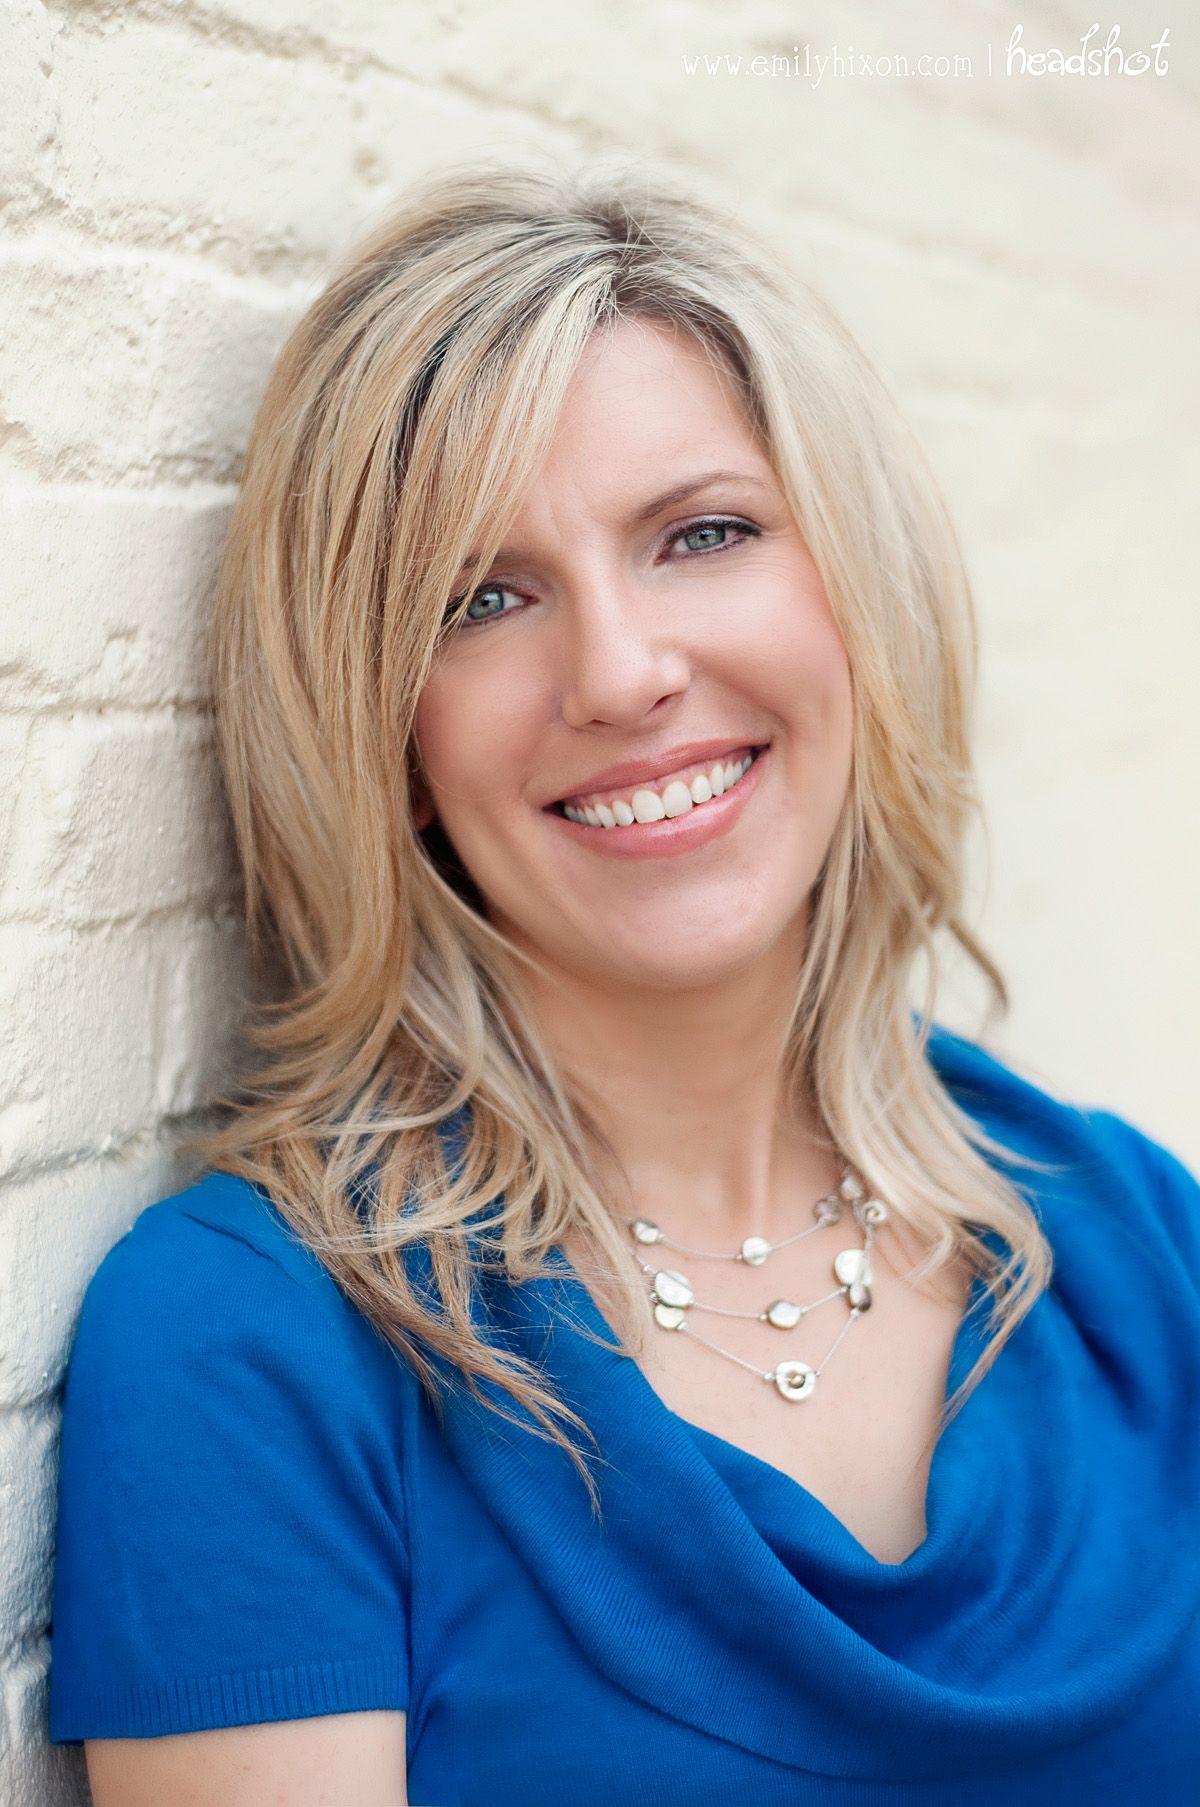 Pin By Emily Imblum On Emily Hixon Photography Headshots Women Headshot Poses Headshots Professional